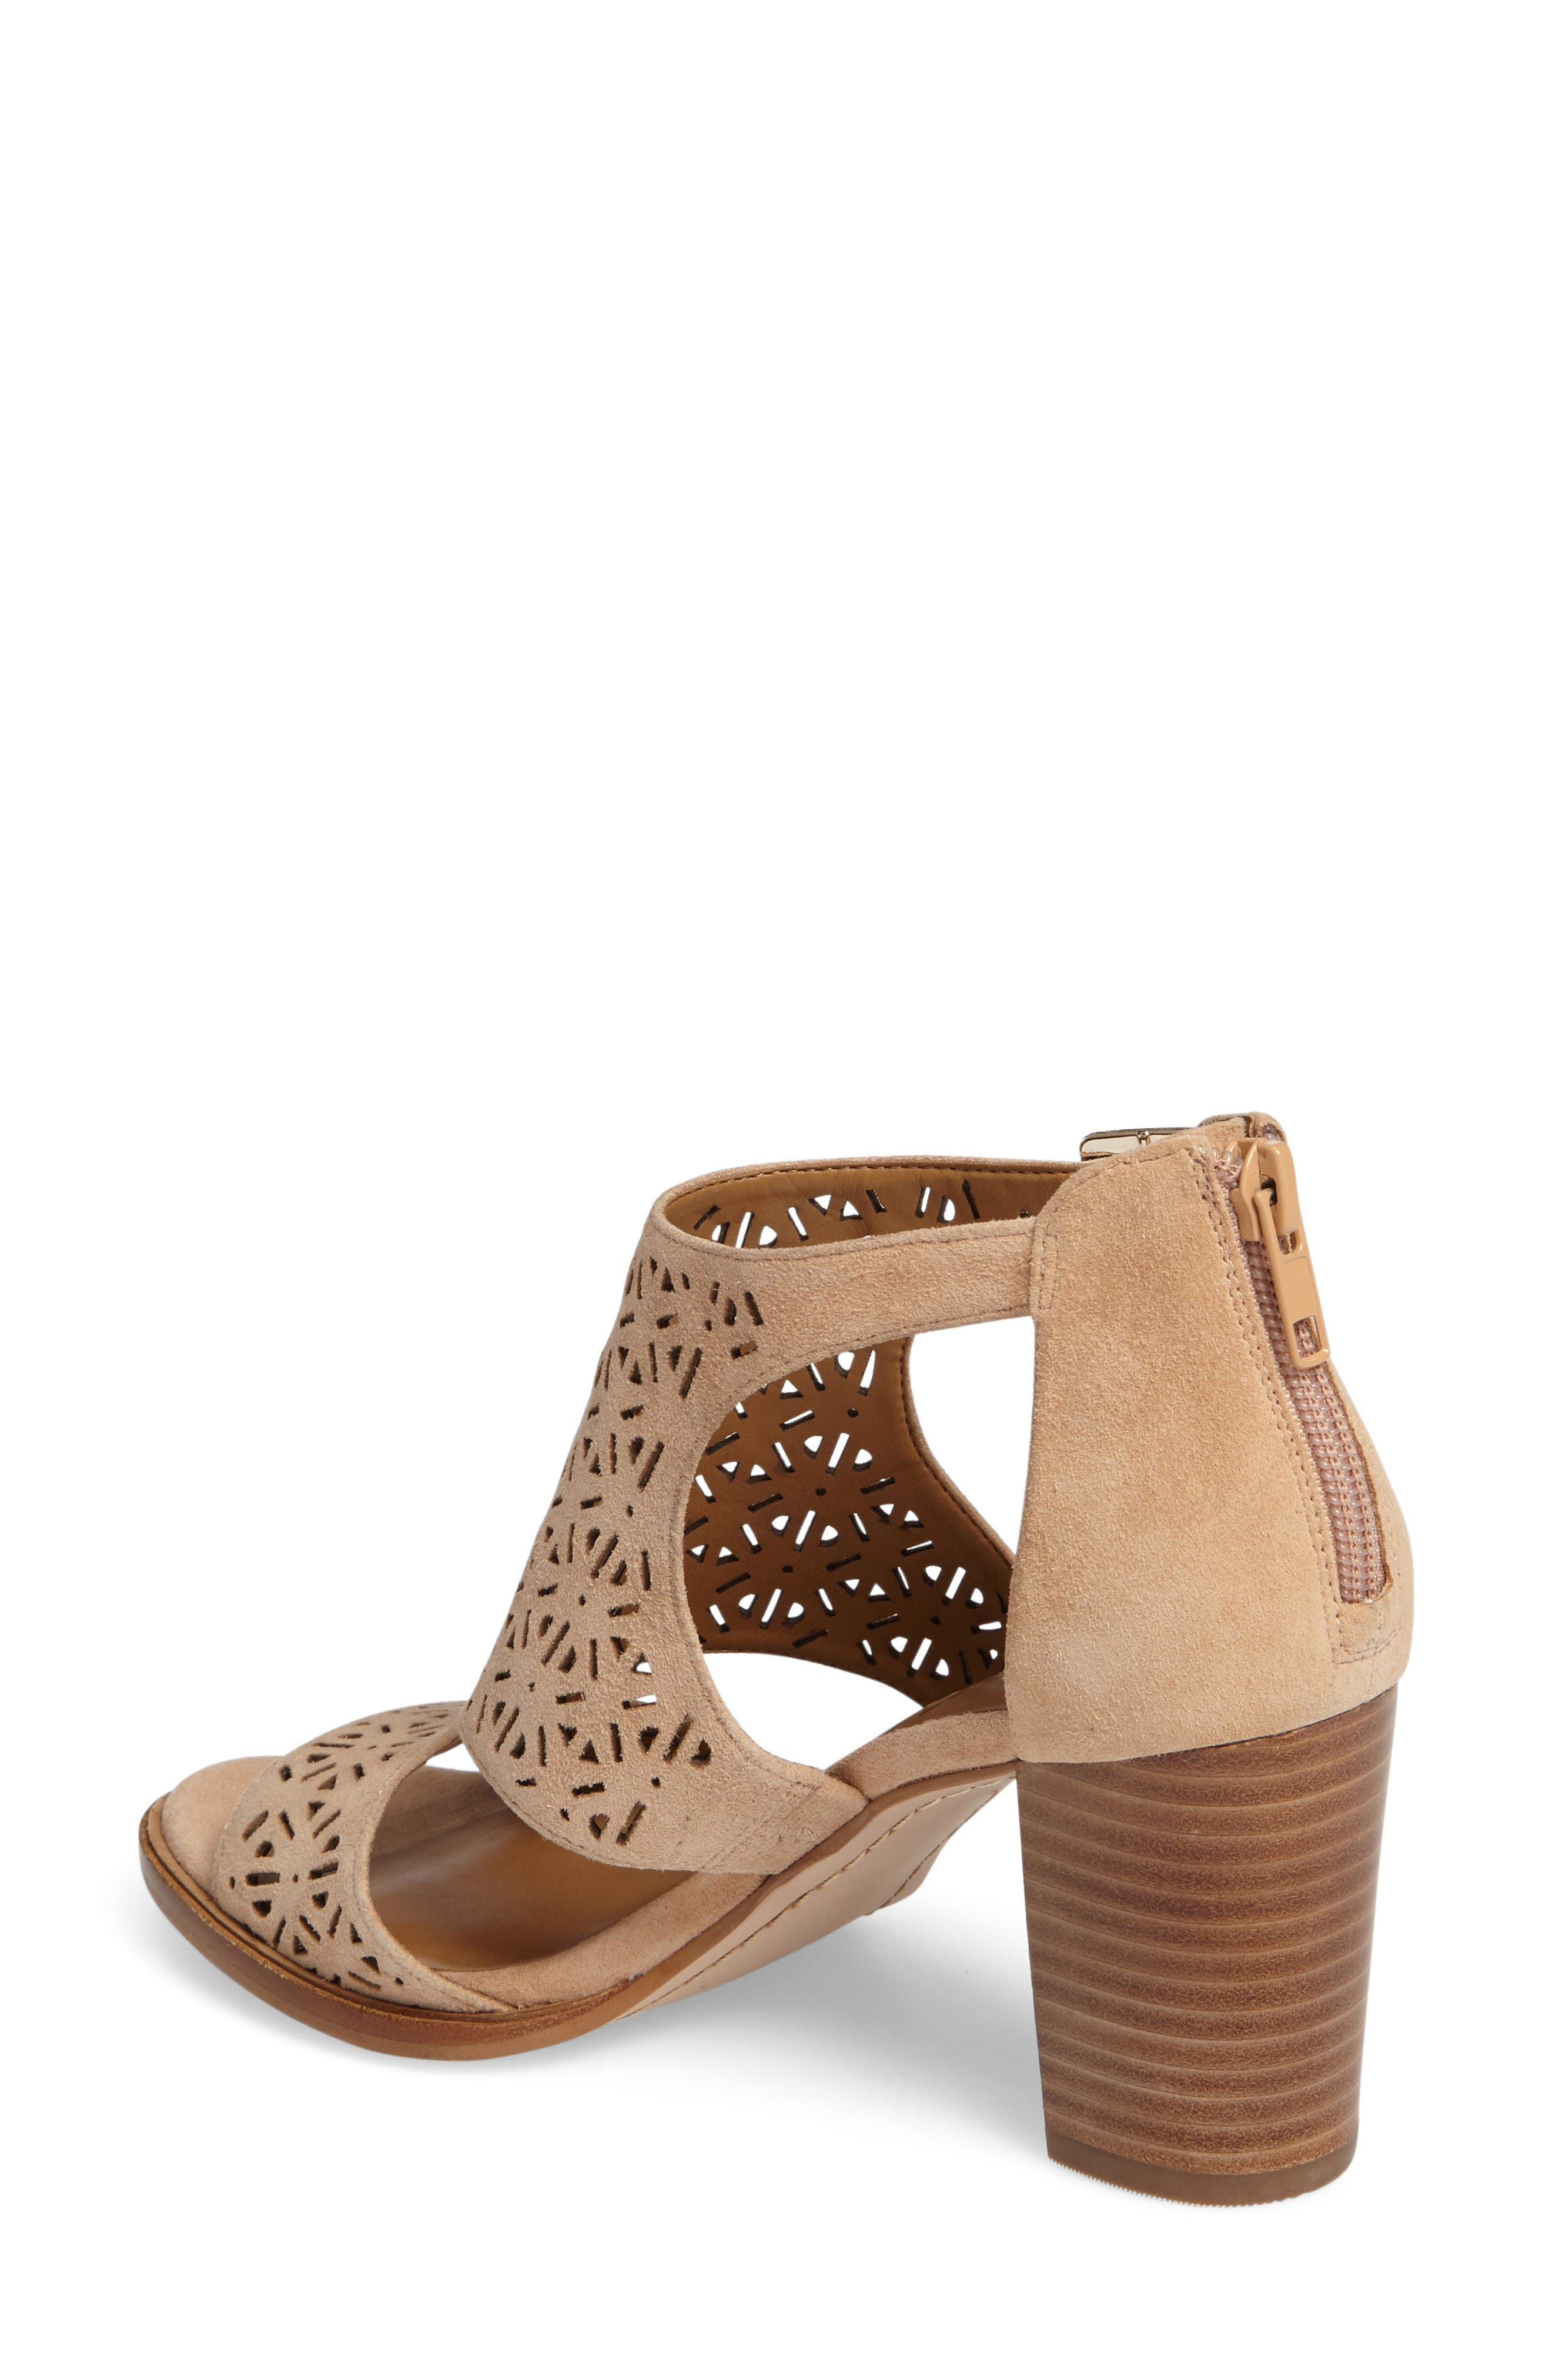 Edythe Block Heel Sandal,                             Alternate thumbnail 2, color,                             Tan Suede